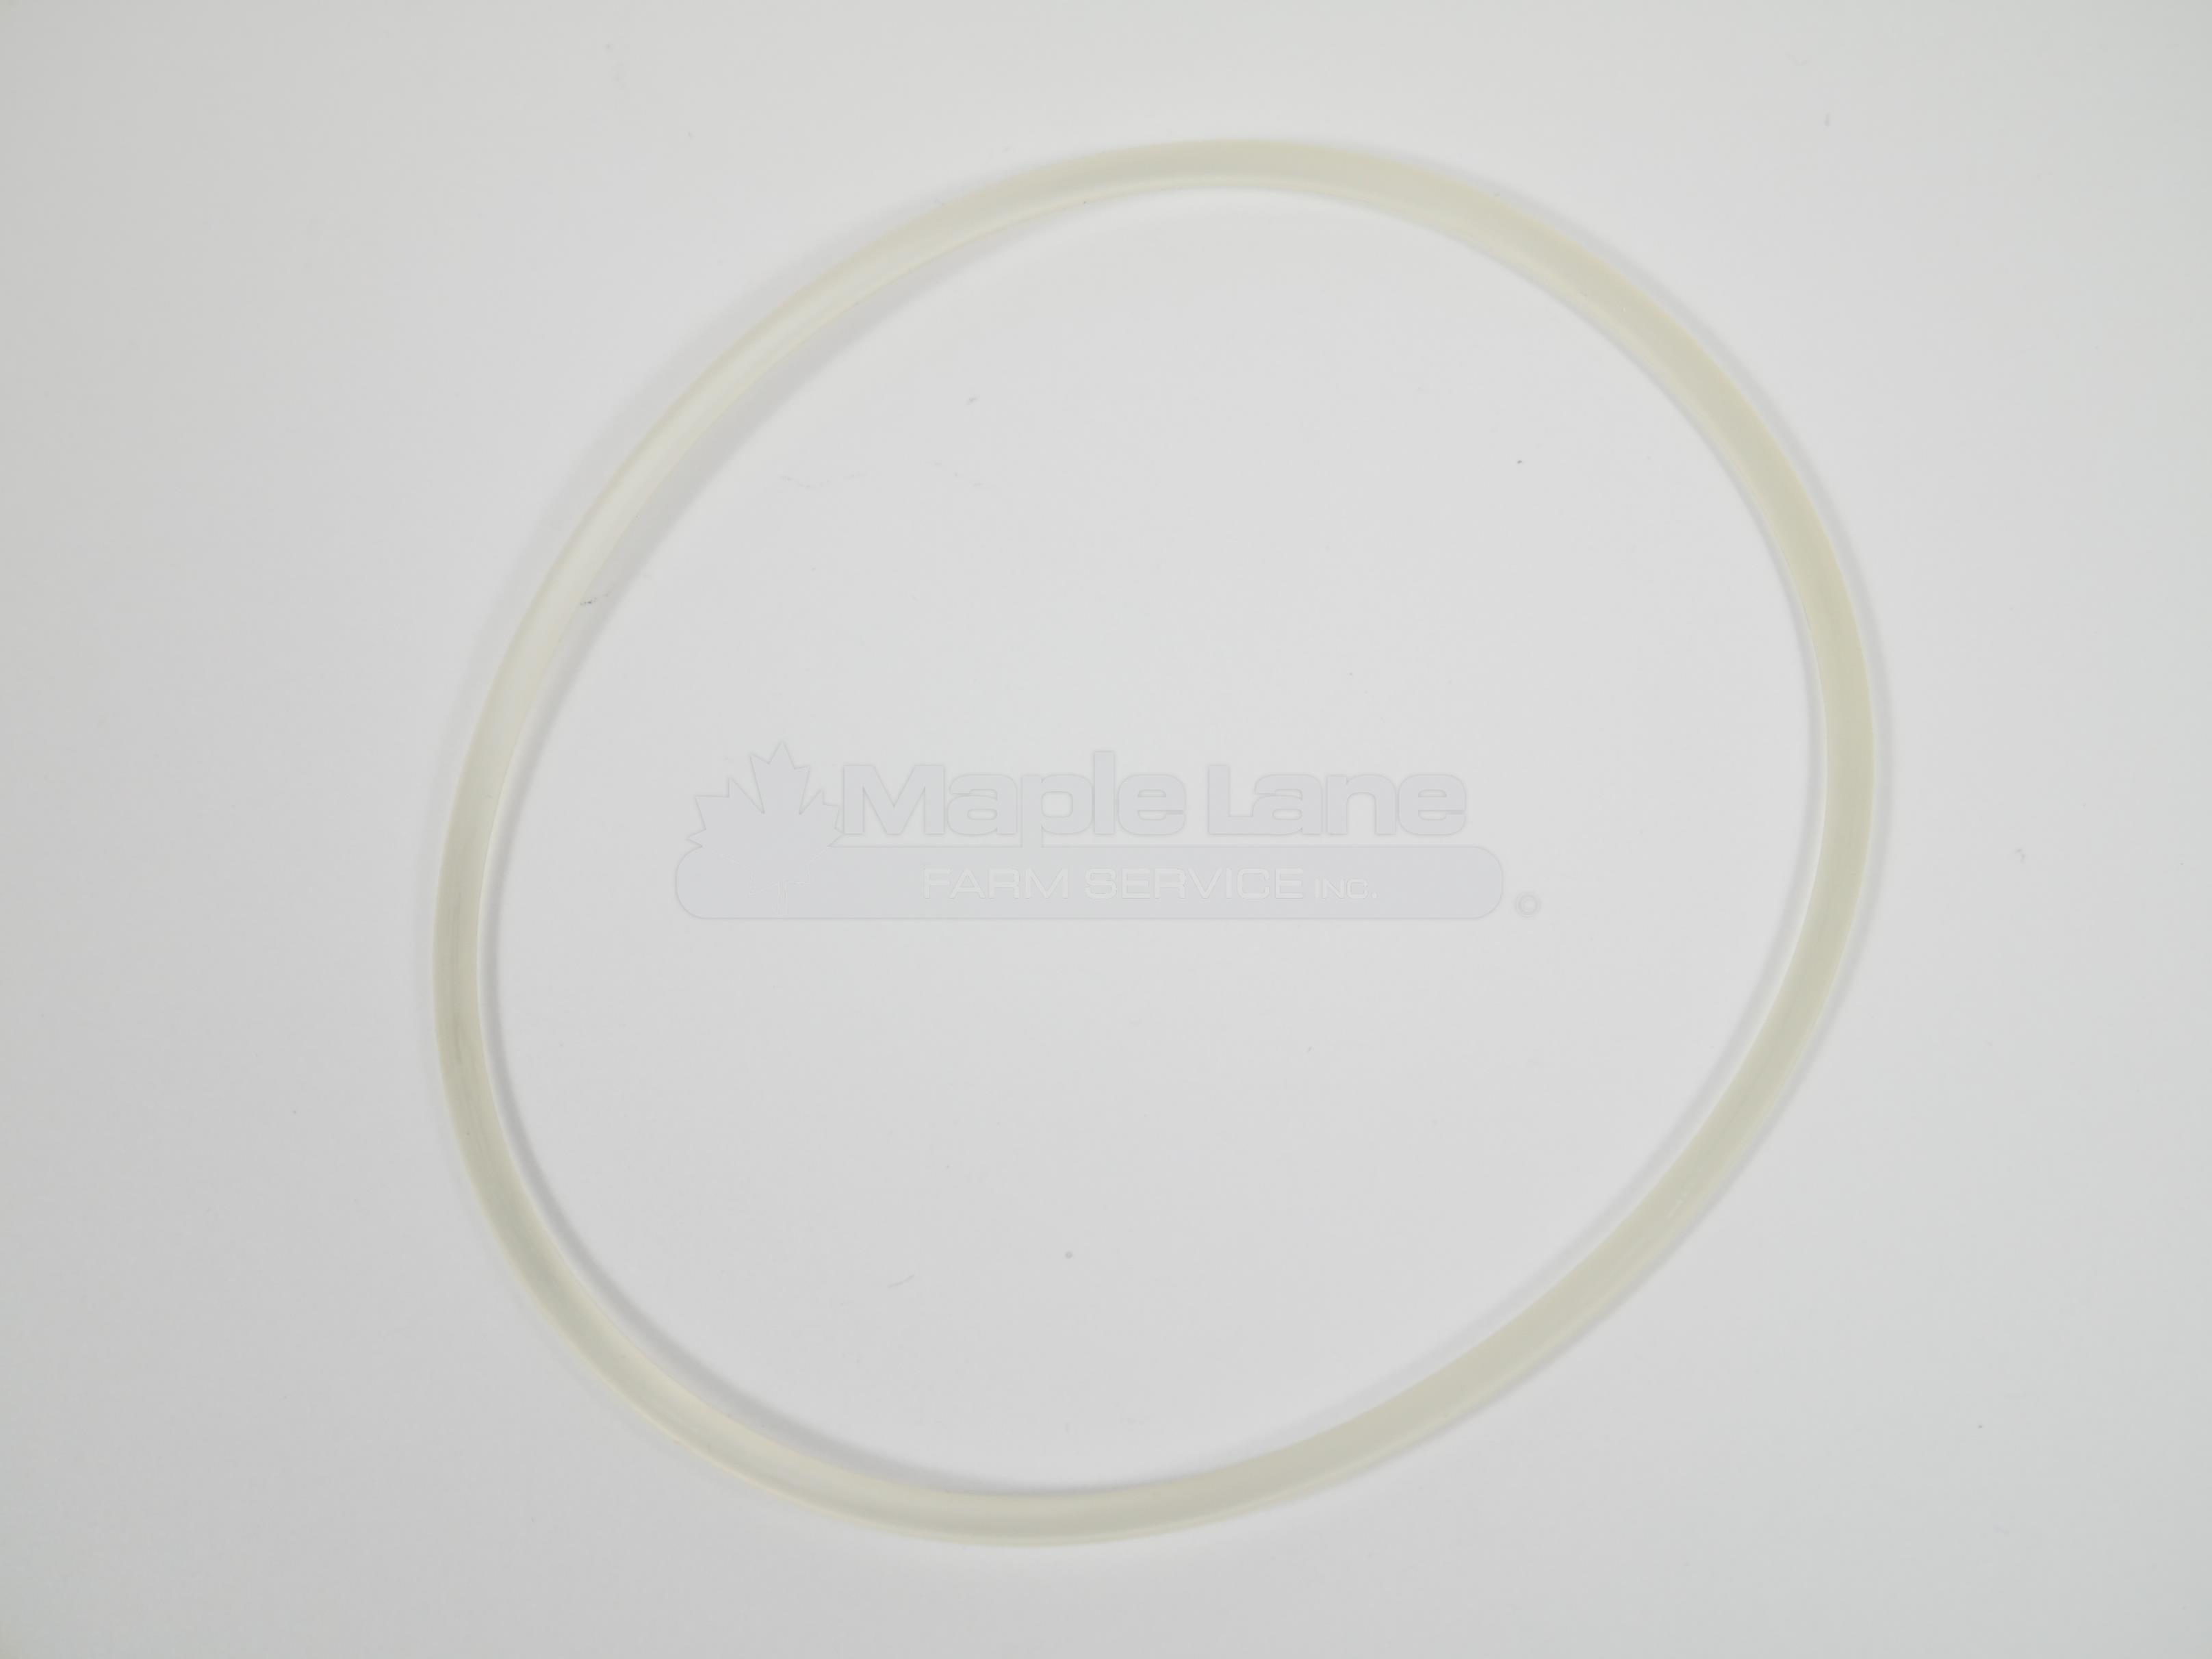 330142 O-Ring